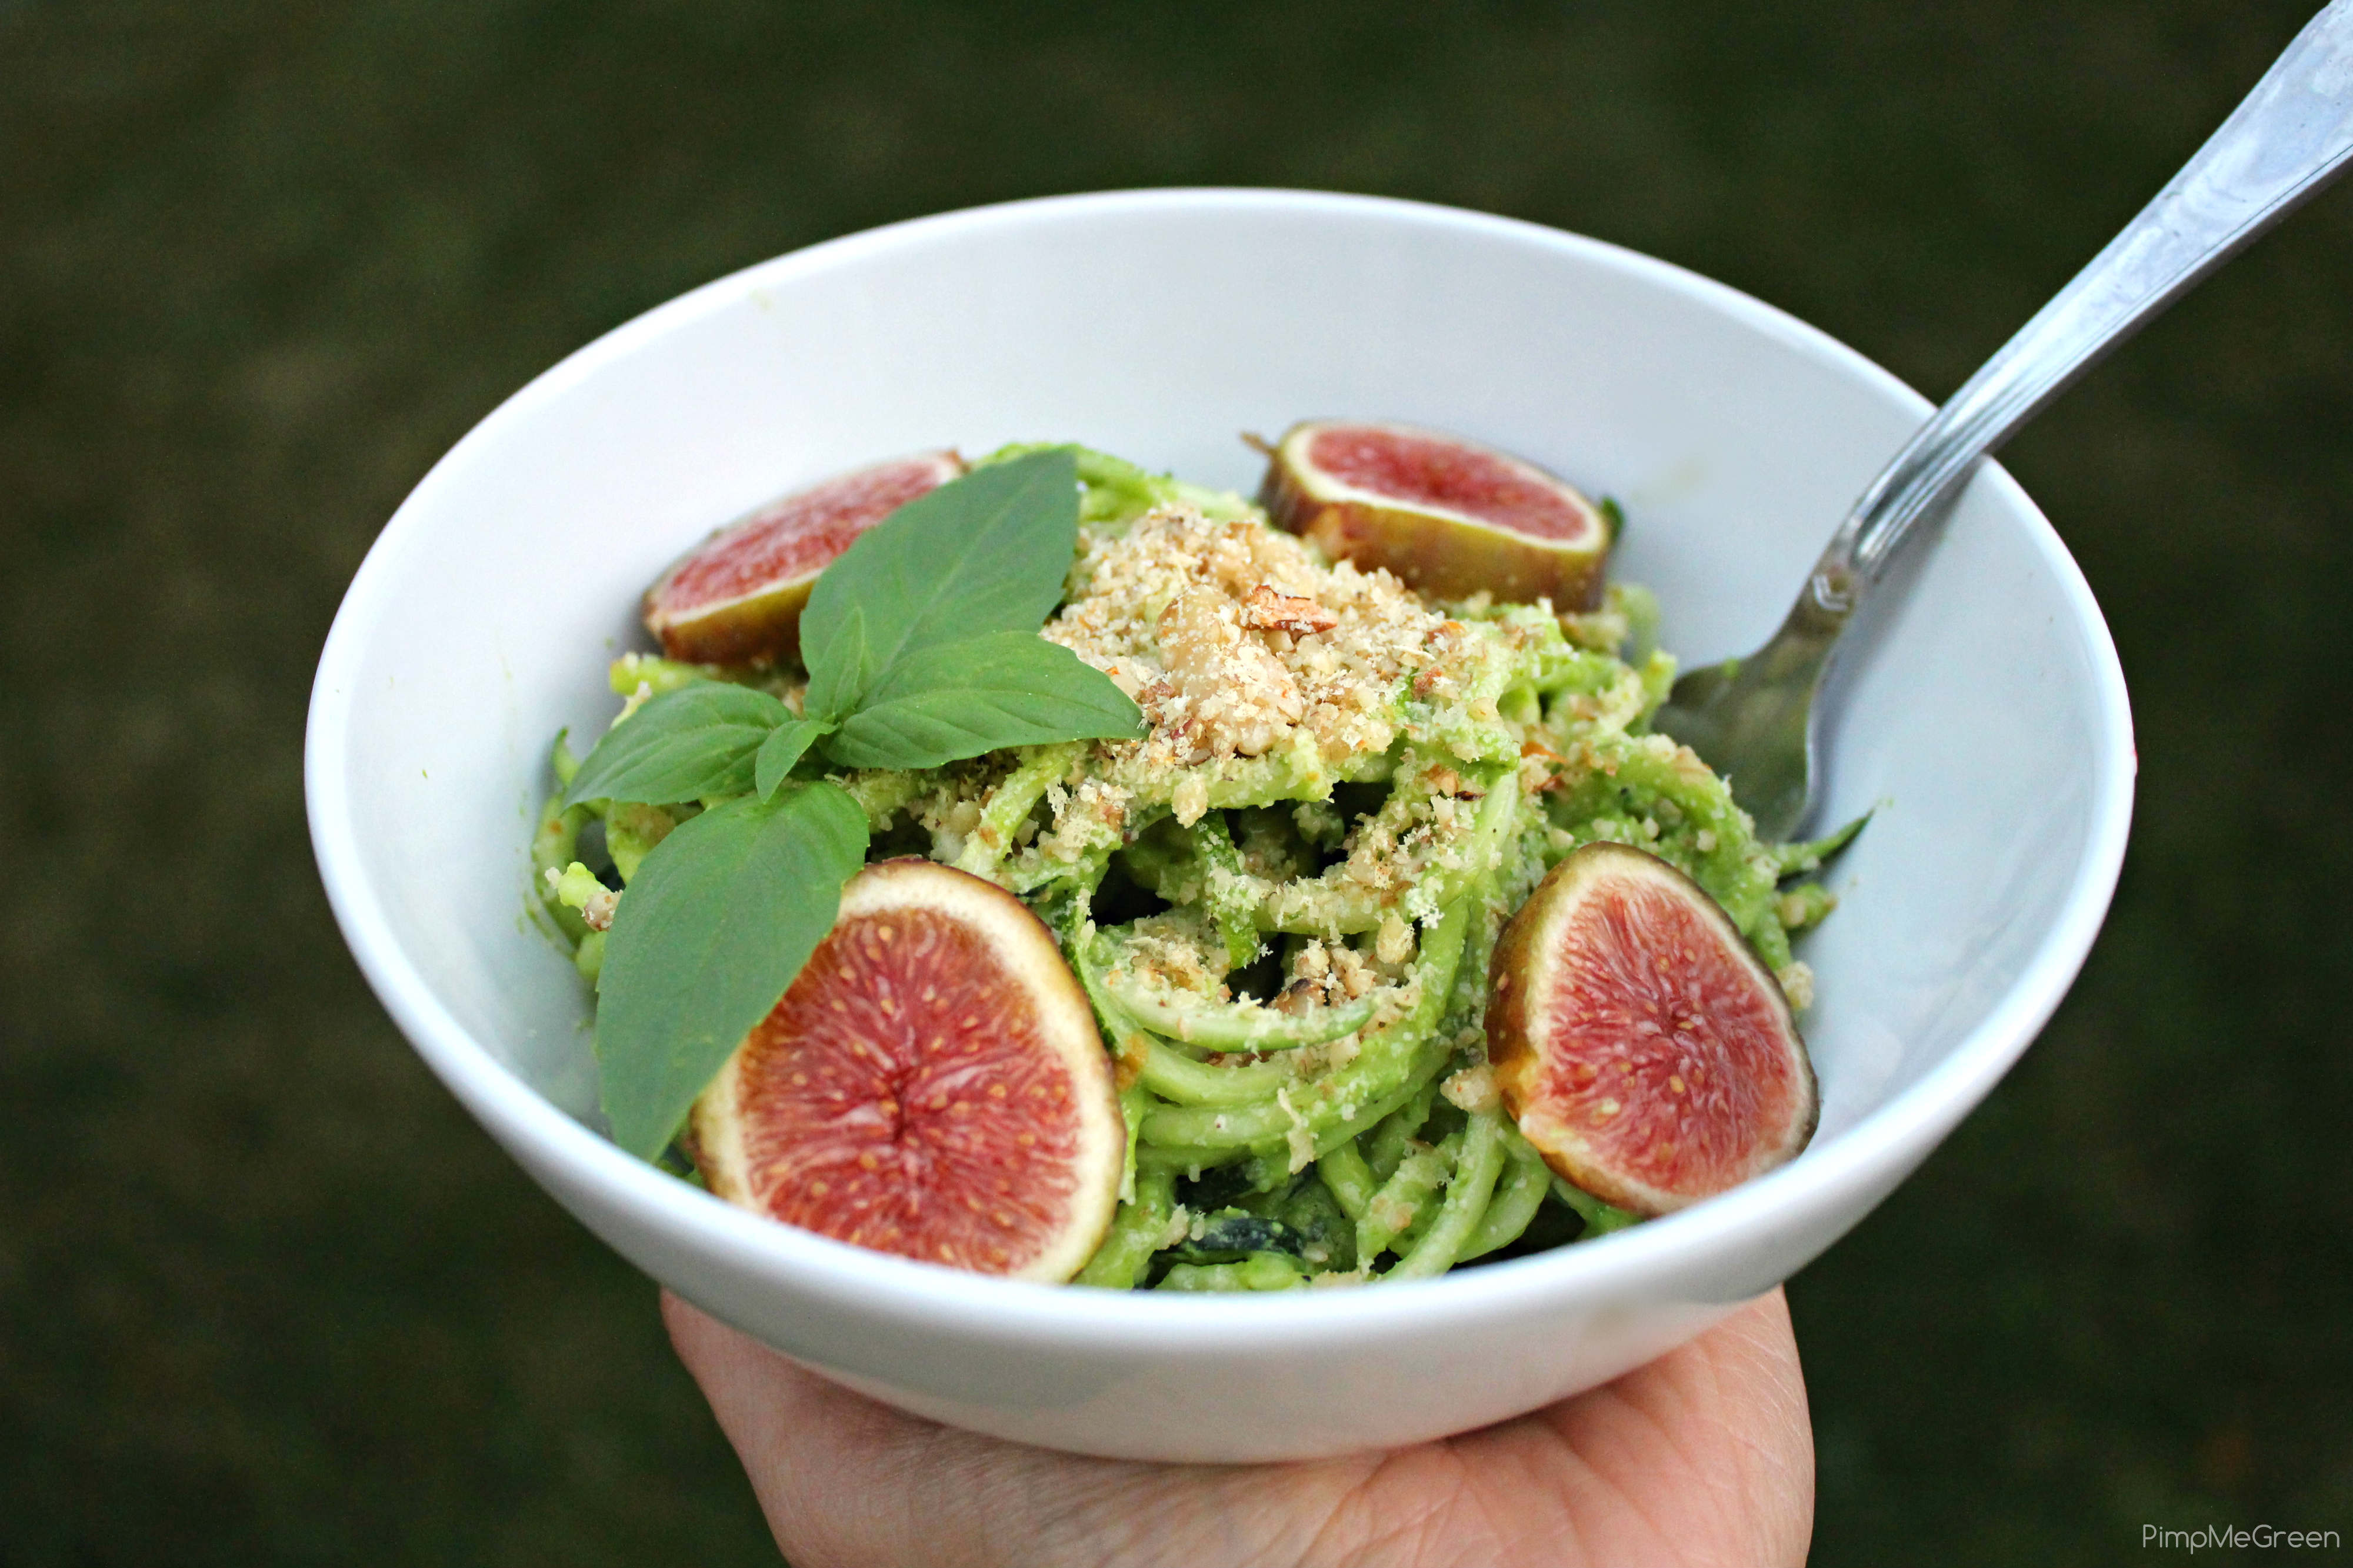 zucchini spaghetti dish titled